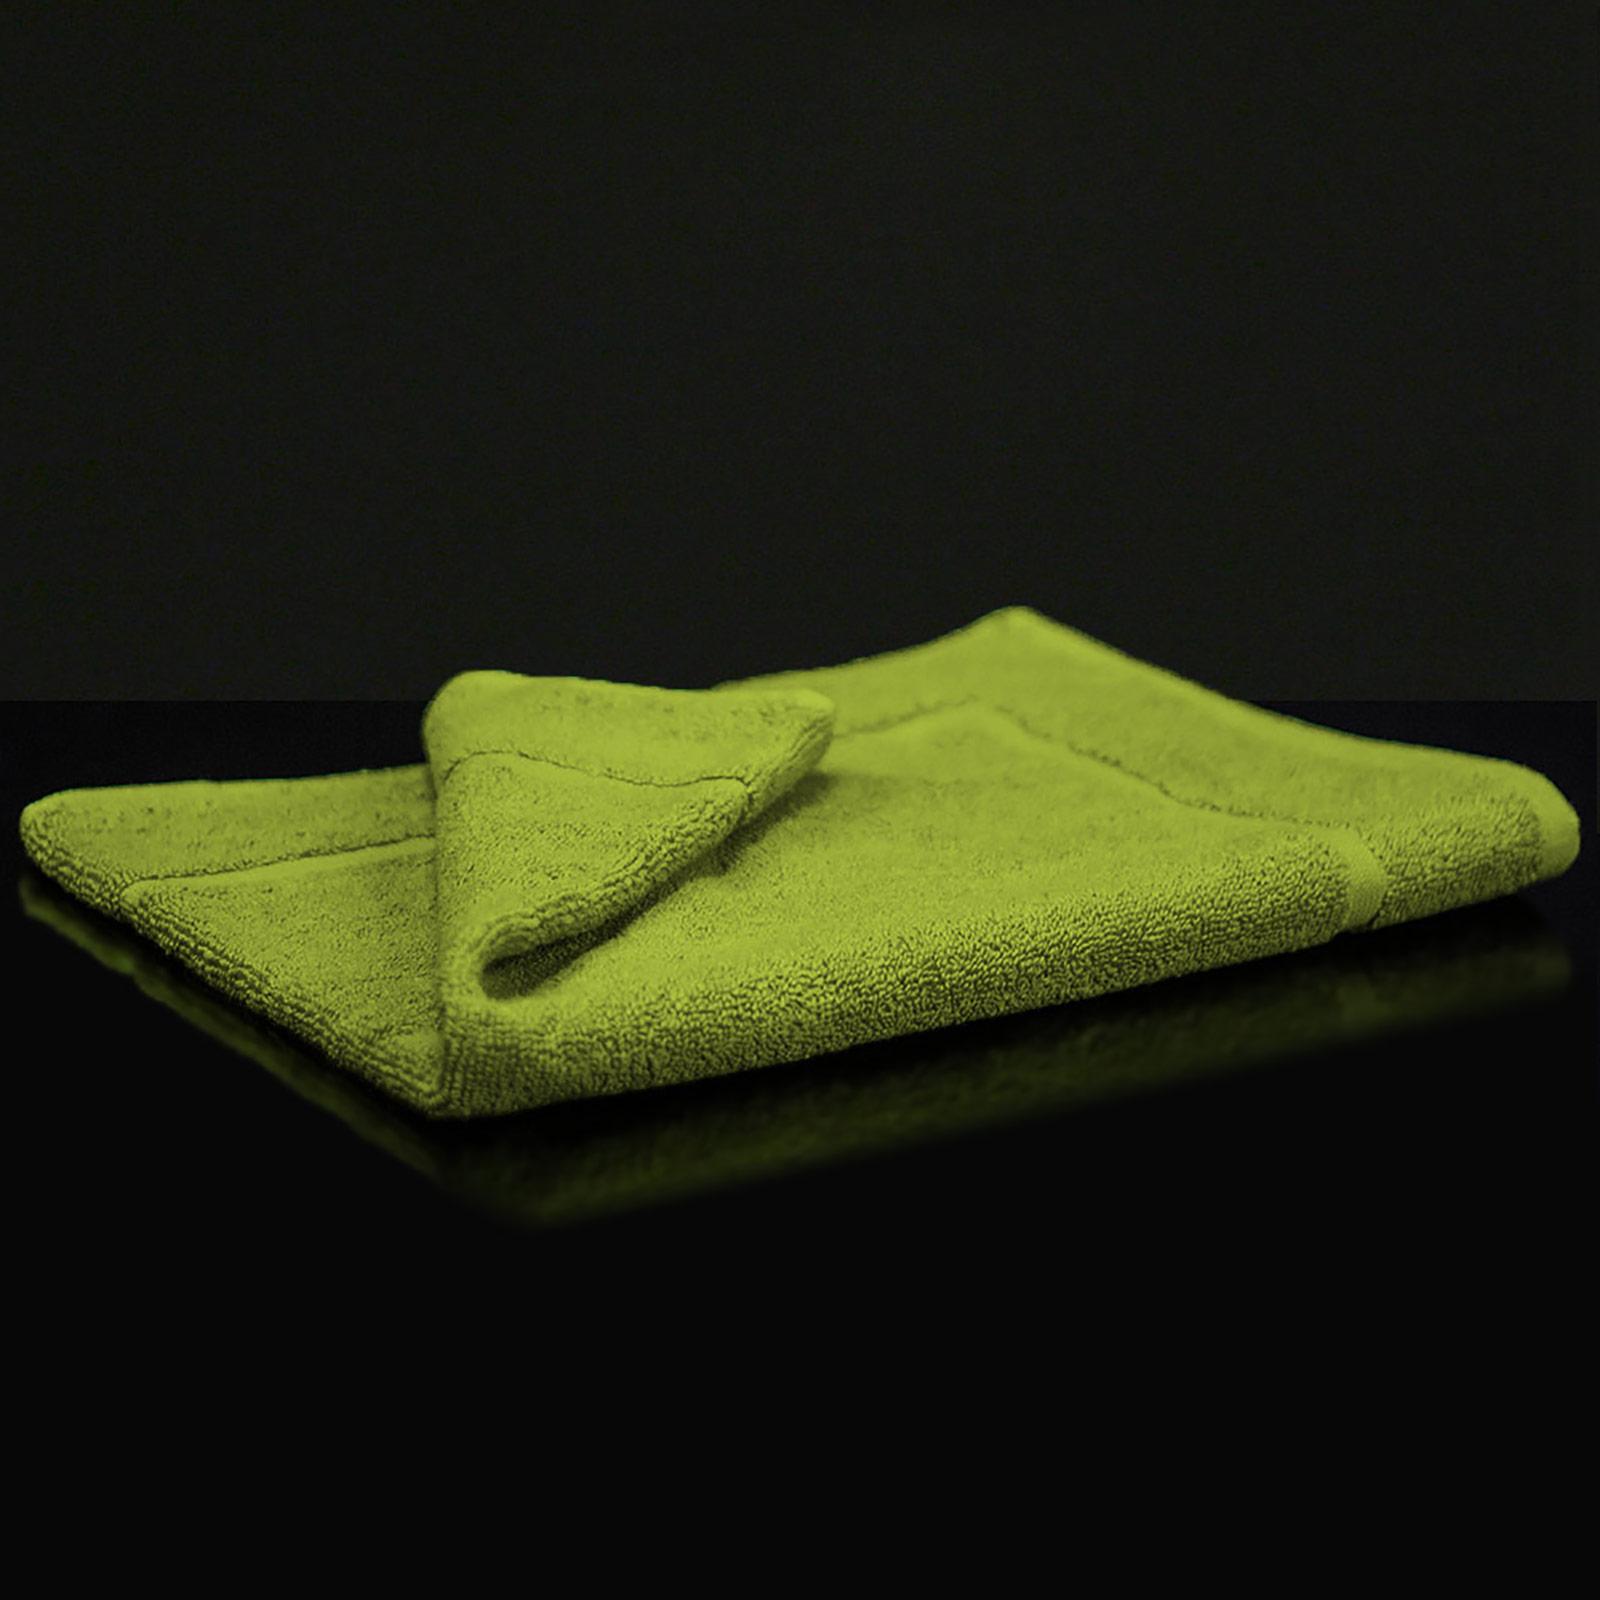 2 badvorleger gr n duschvorleger badteppich vorleger dusche bad baumwolle ebay. Black Bedroom Furniture Sets. Home Design Ideas